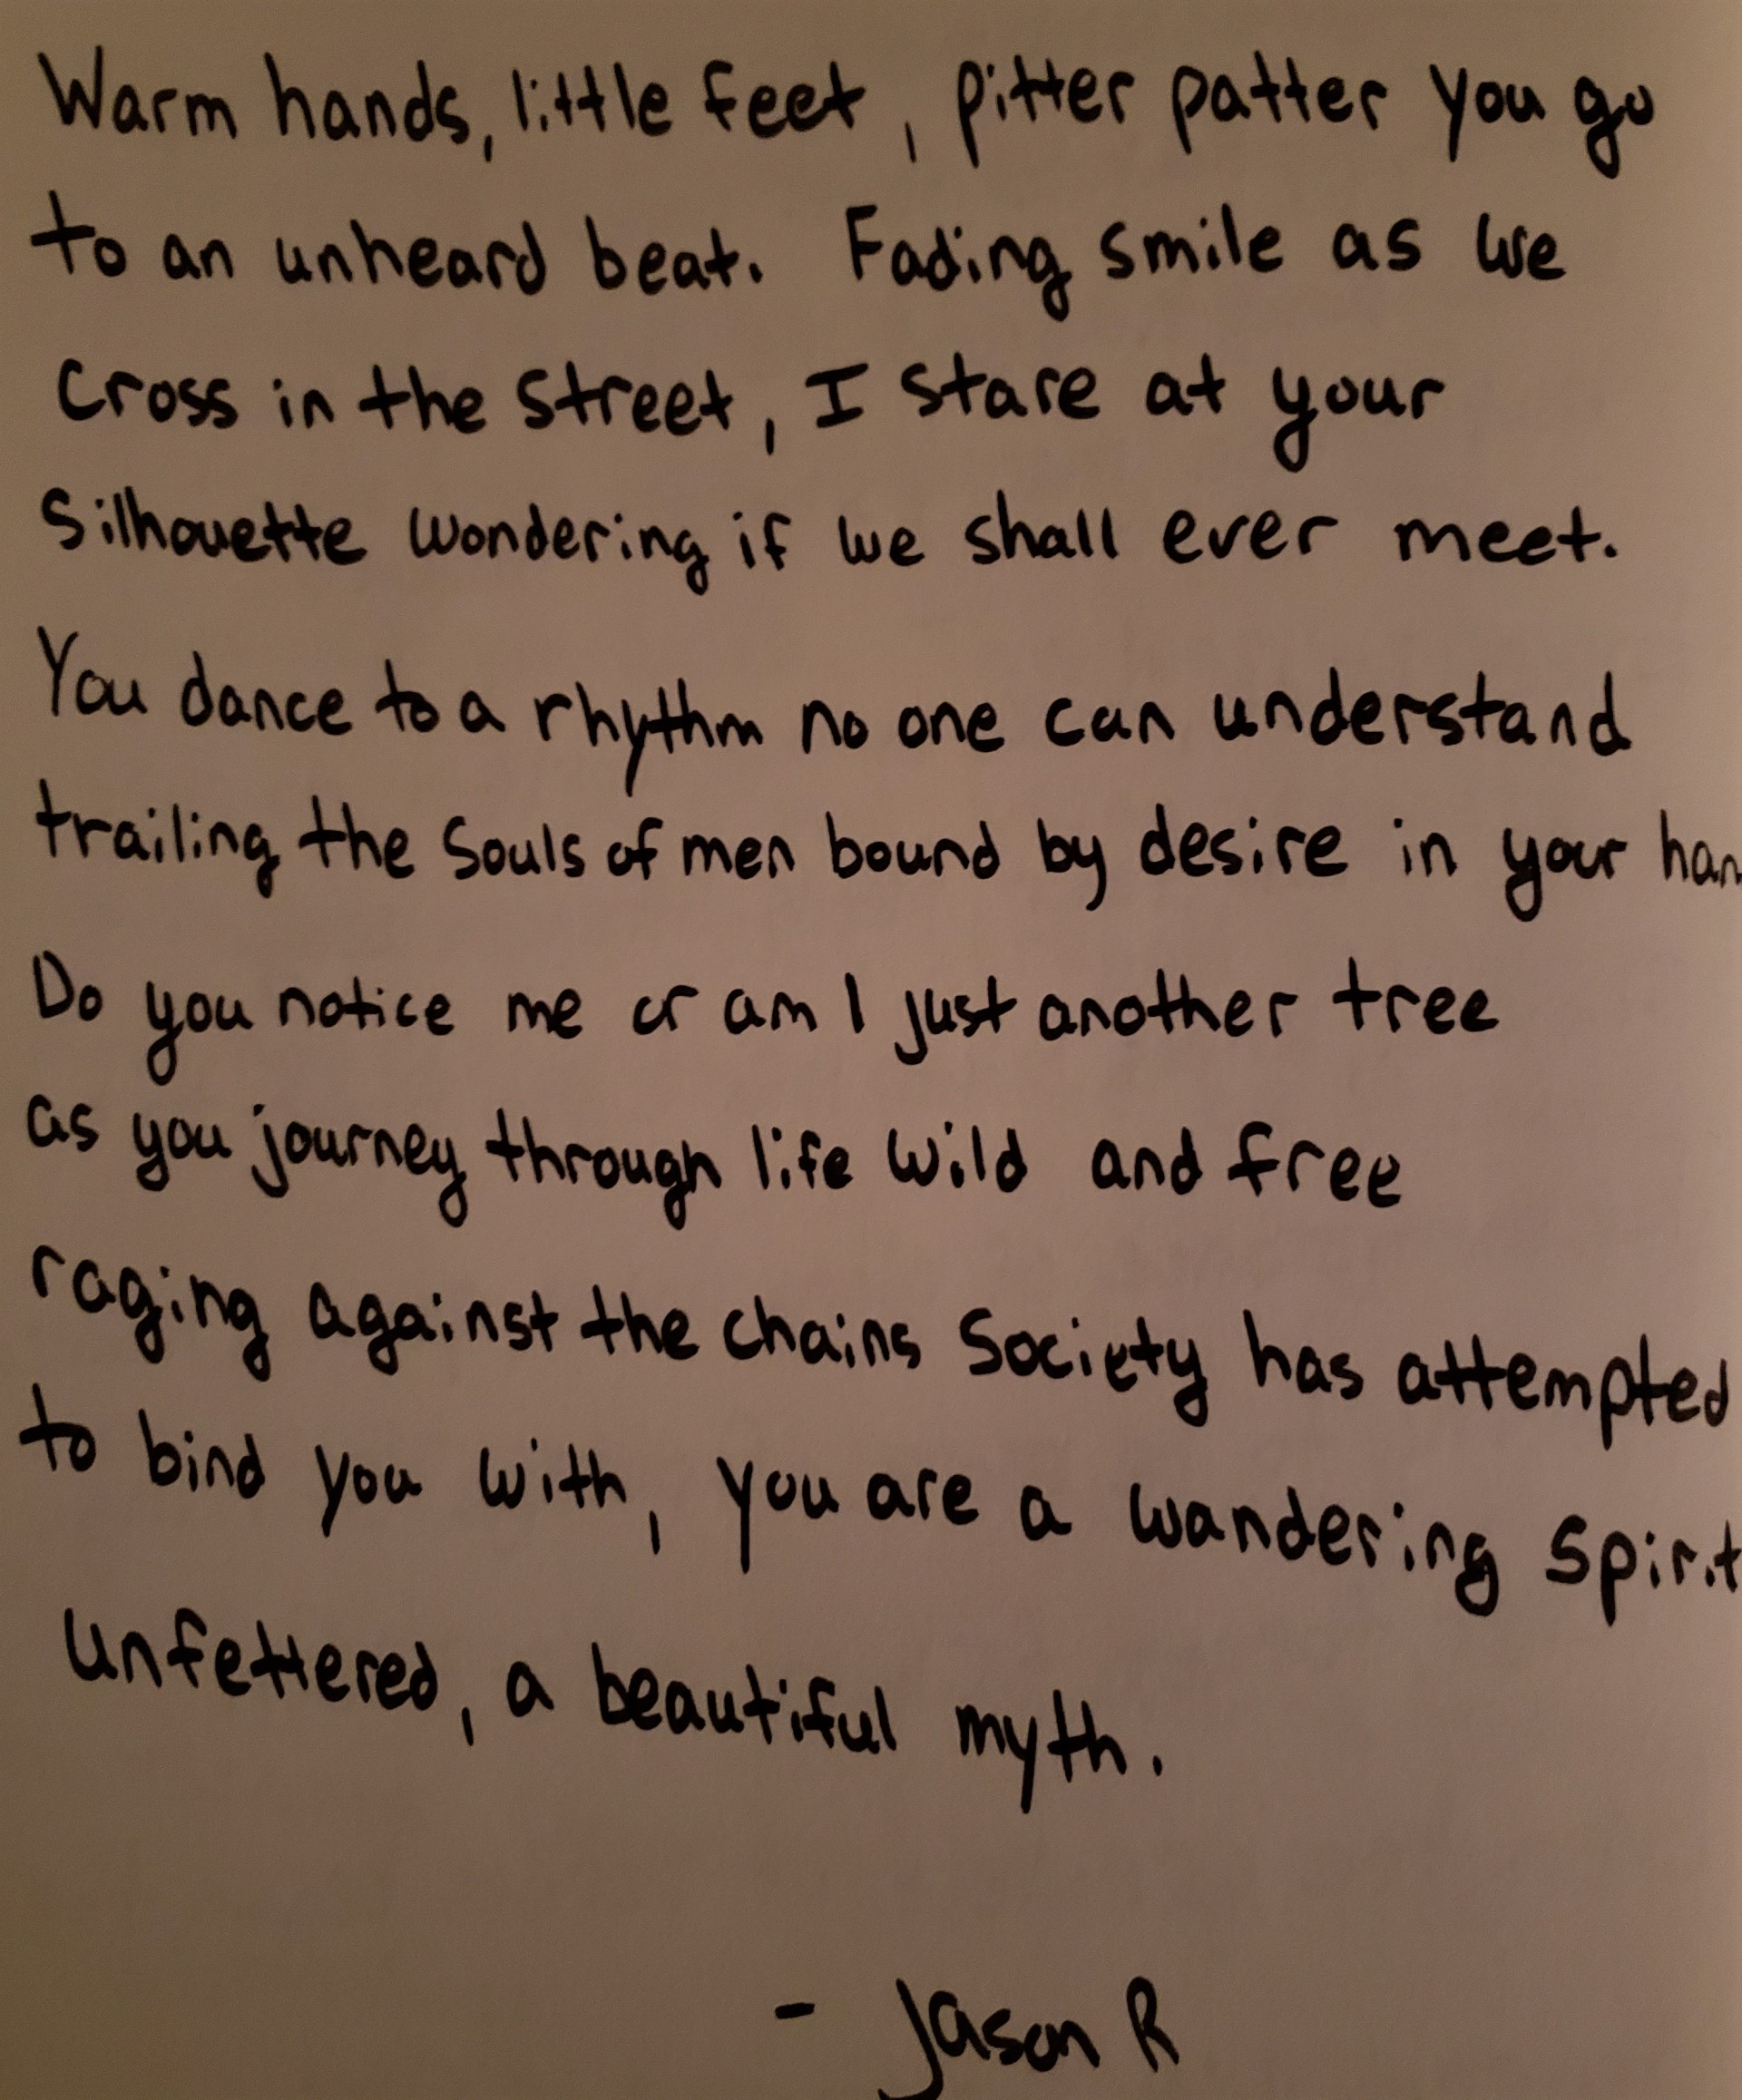 Beautiful myth